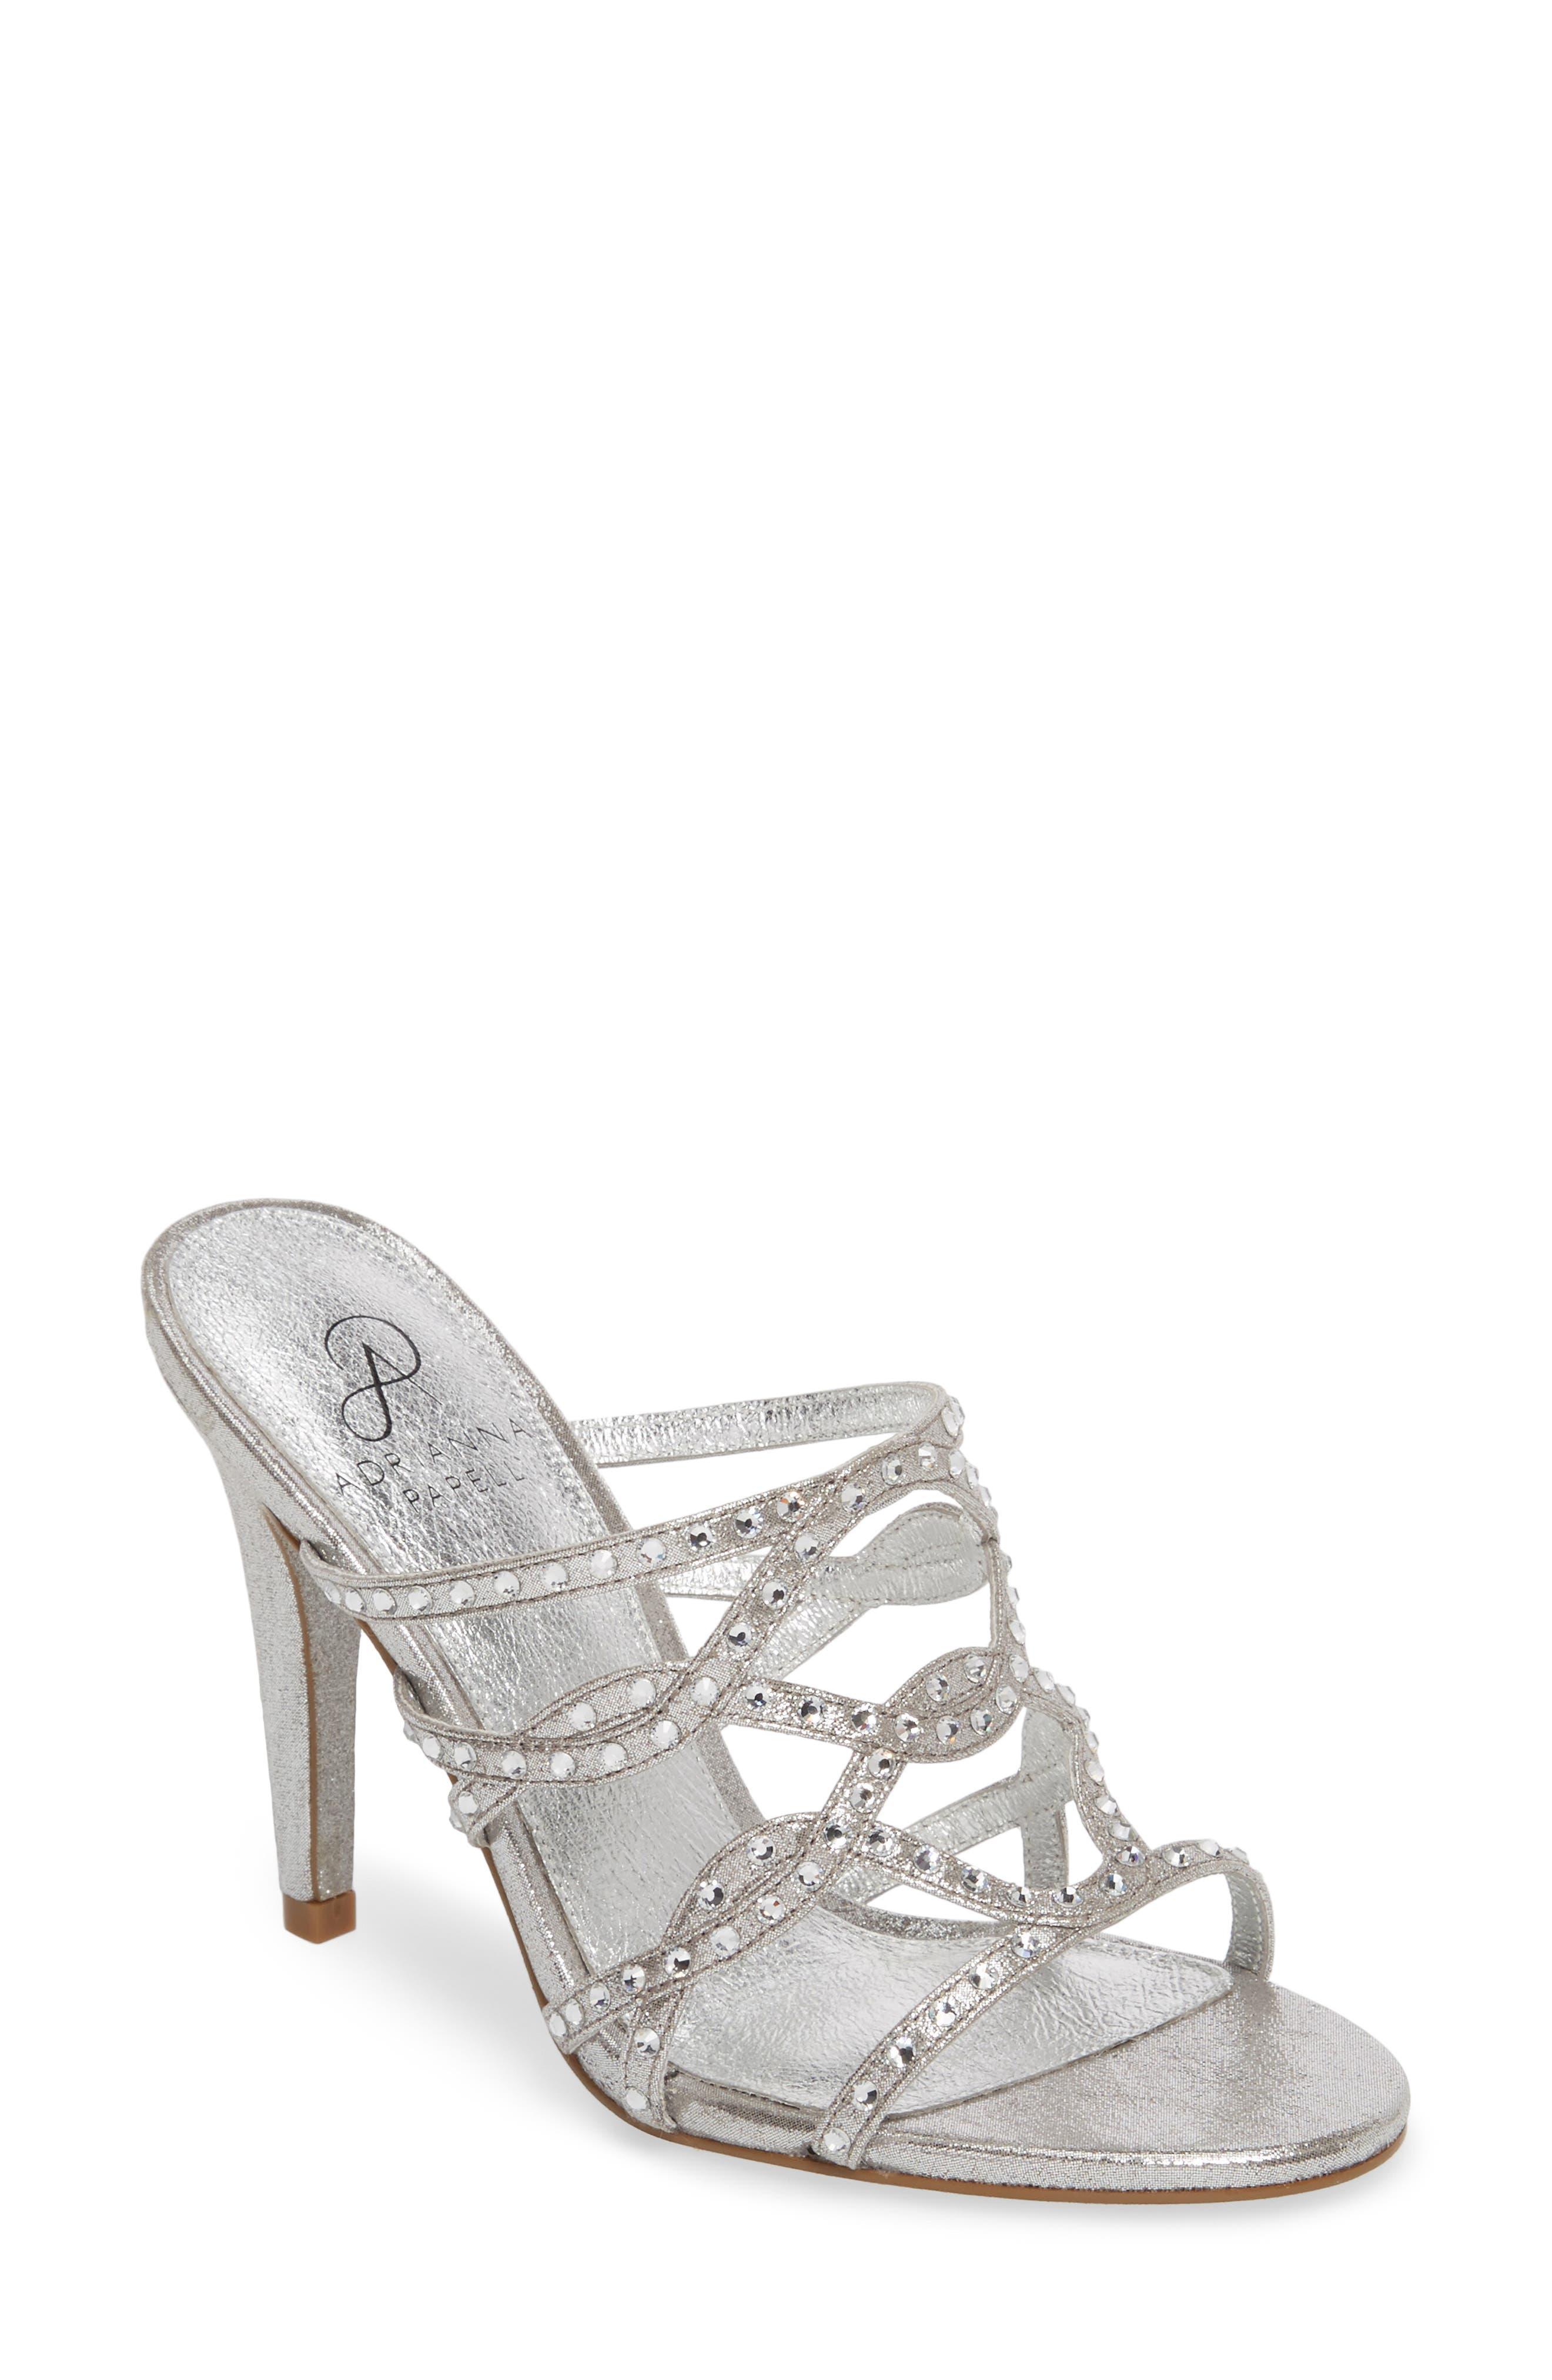 Emma Strappy Sandal,                         Main,                         color, Silver Fabric